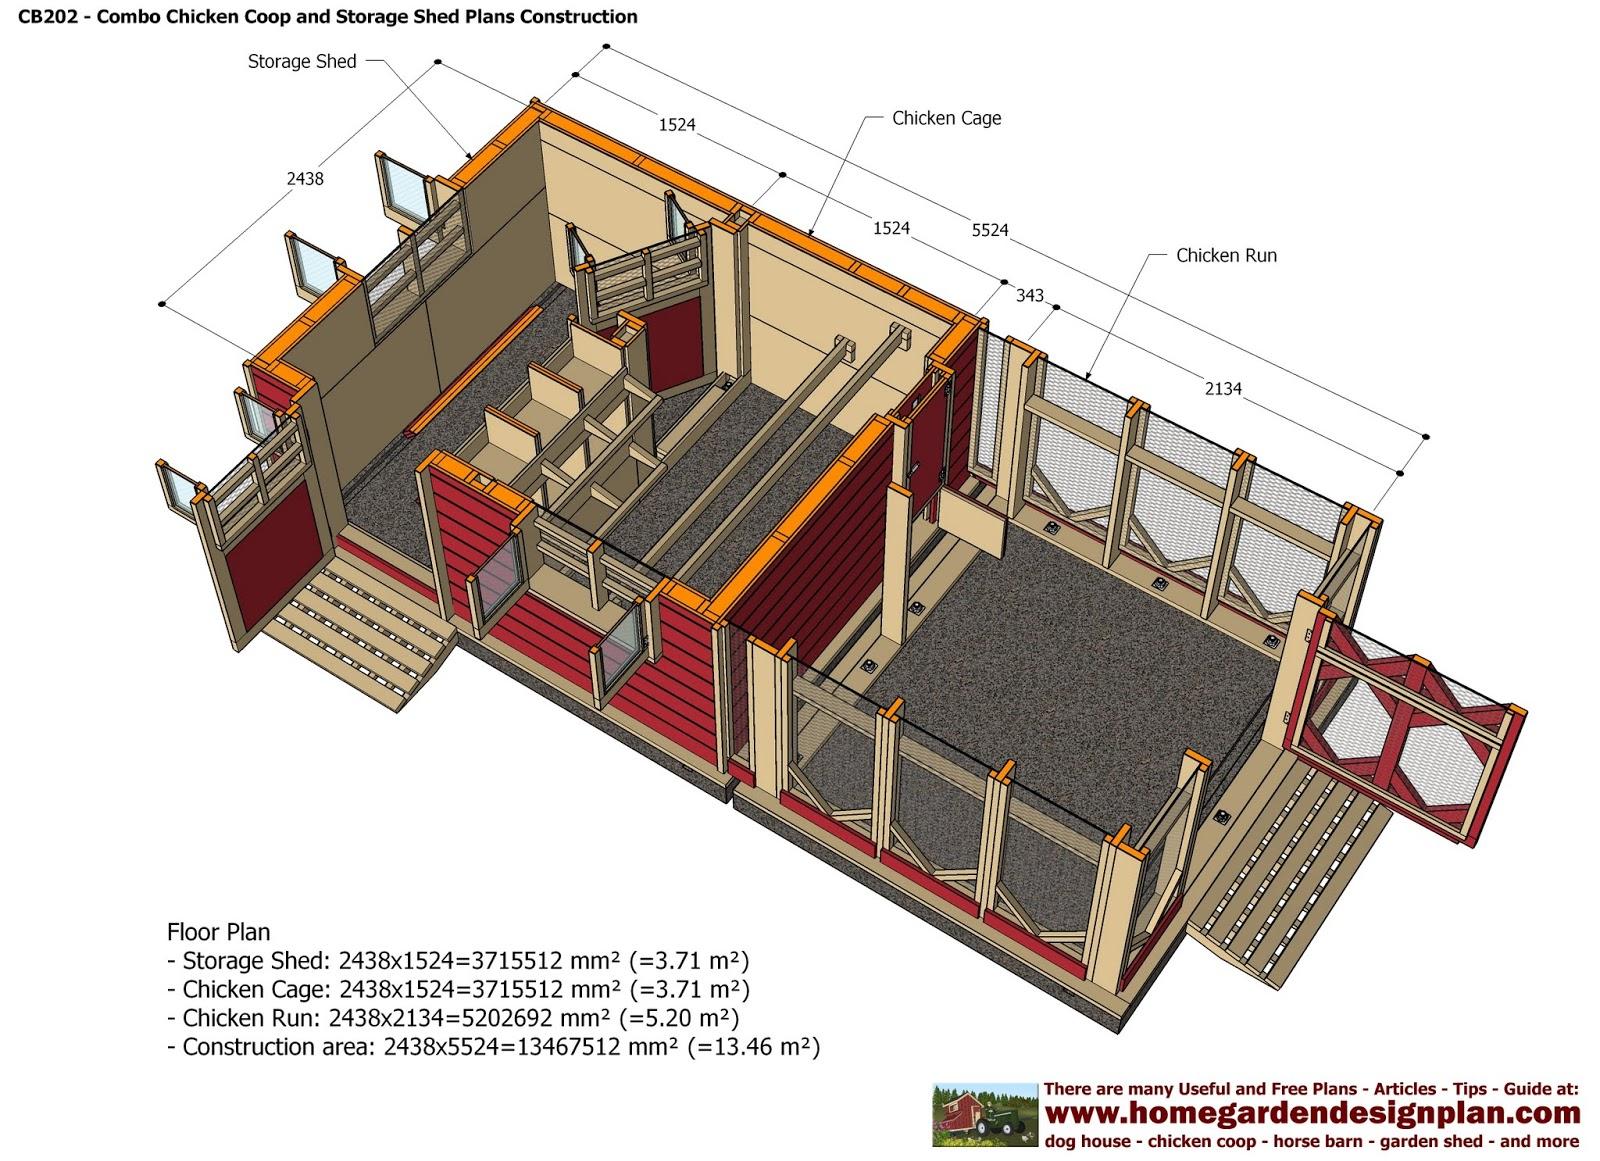 CB202 Combo Plans Chicken Coop Plans Construction Garden ...